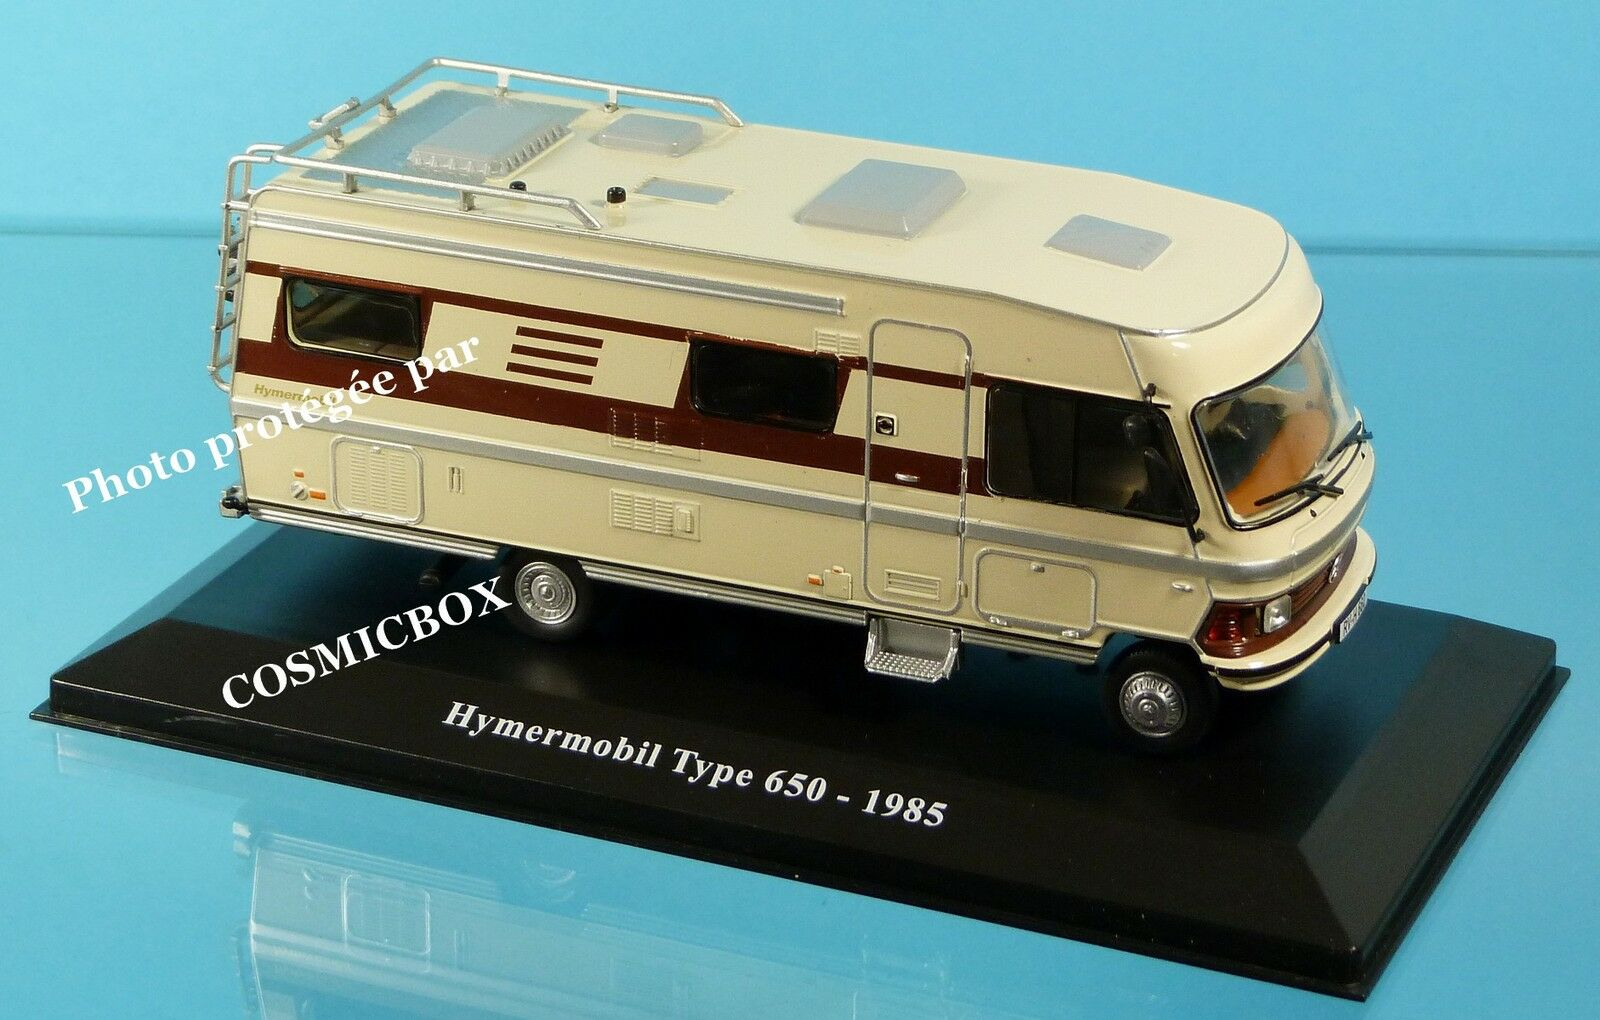 Camping - wagen hymermobil art 650 de son 1985 hymer int é gral caravane neuf